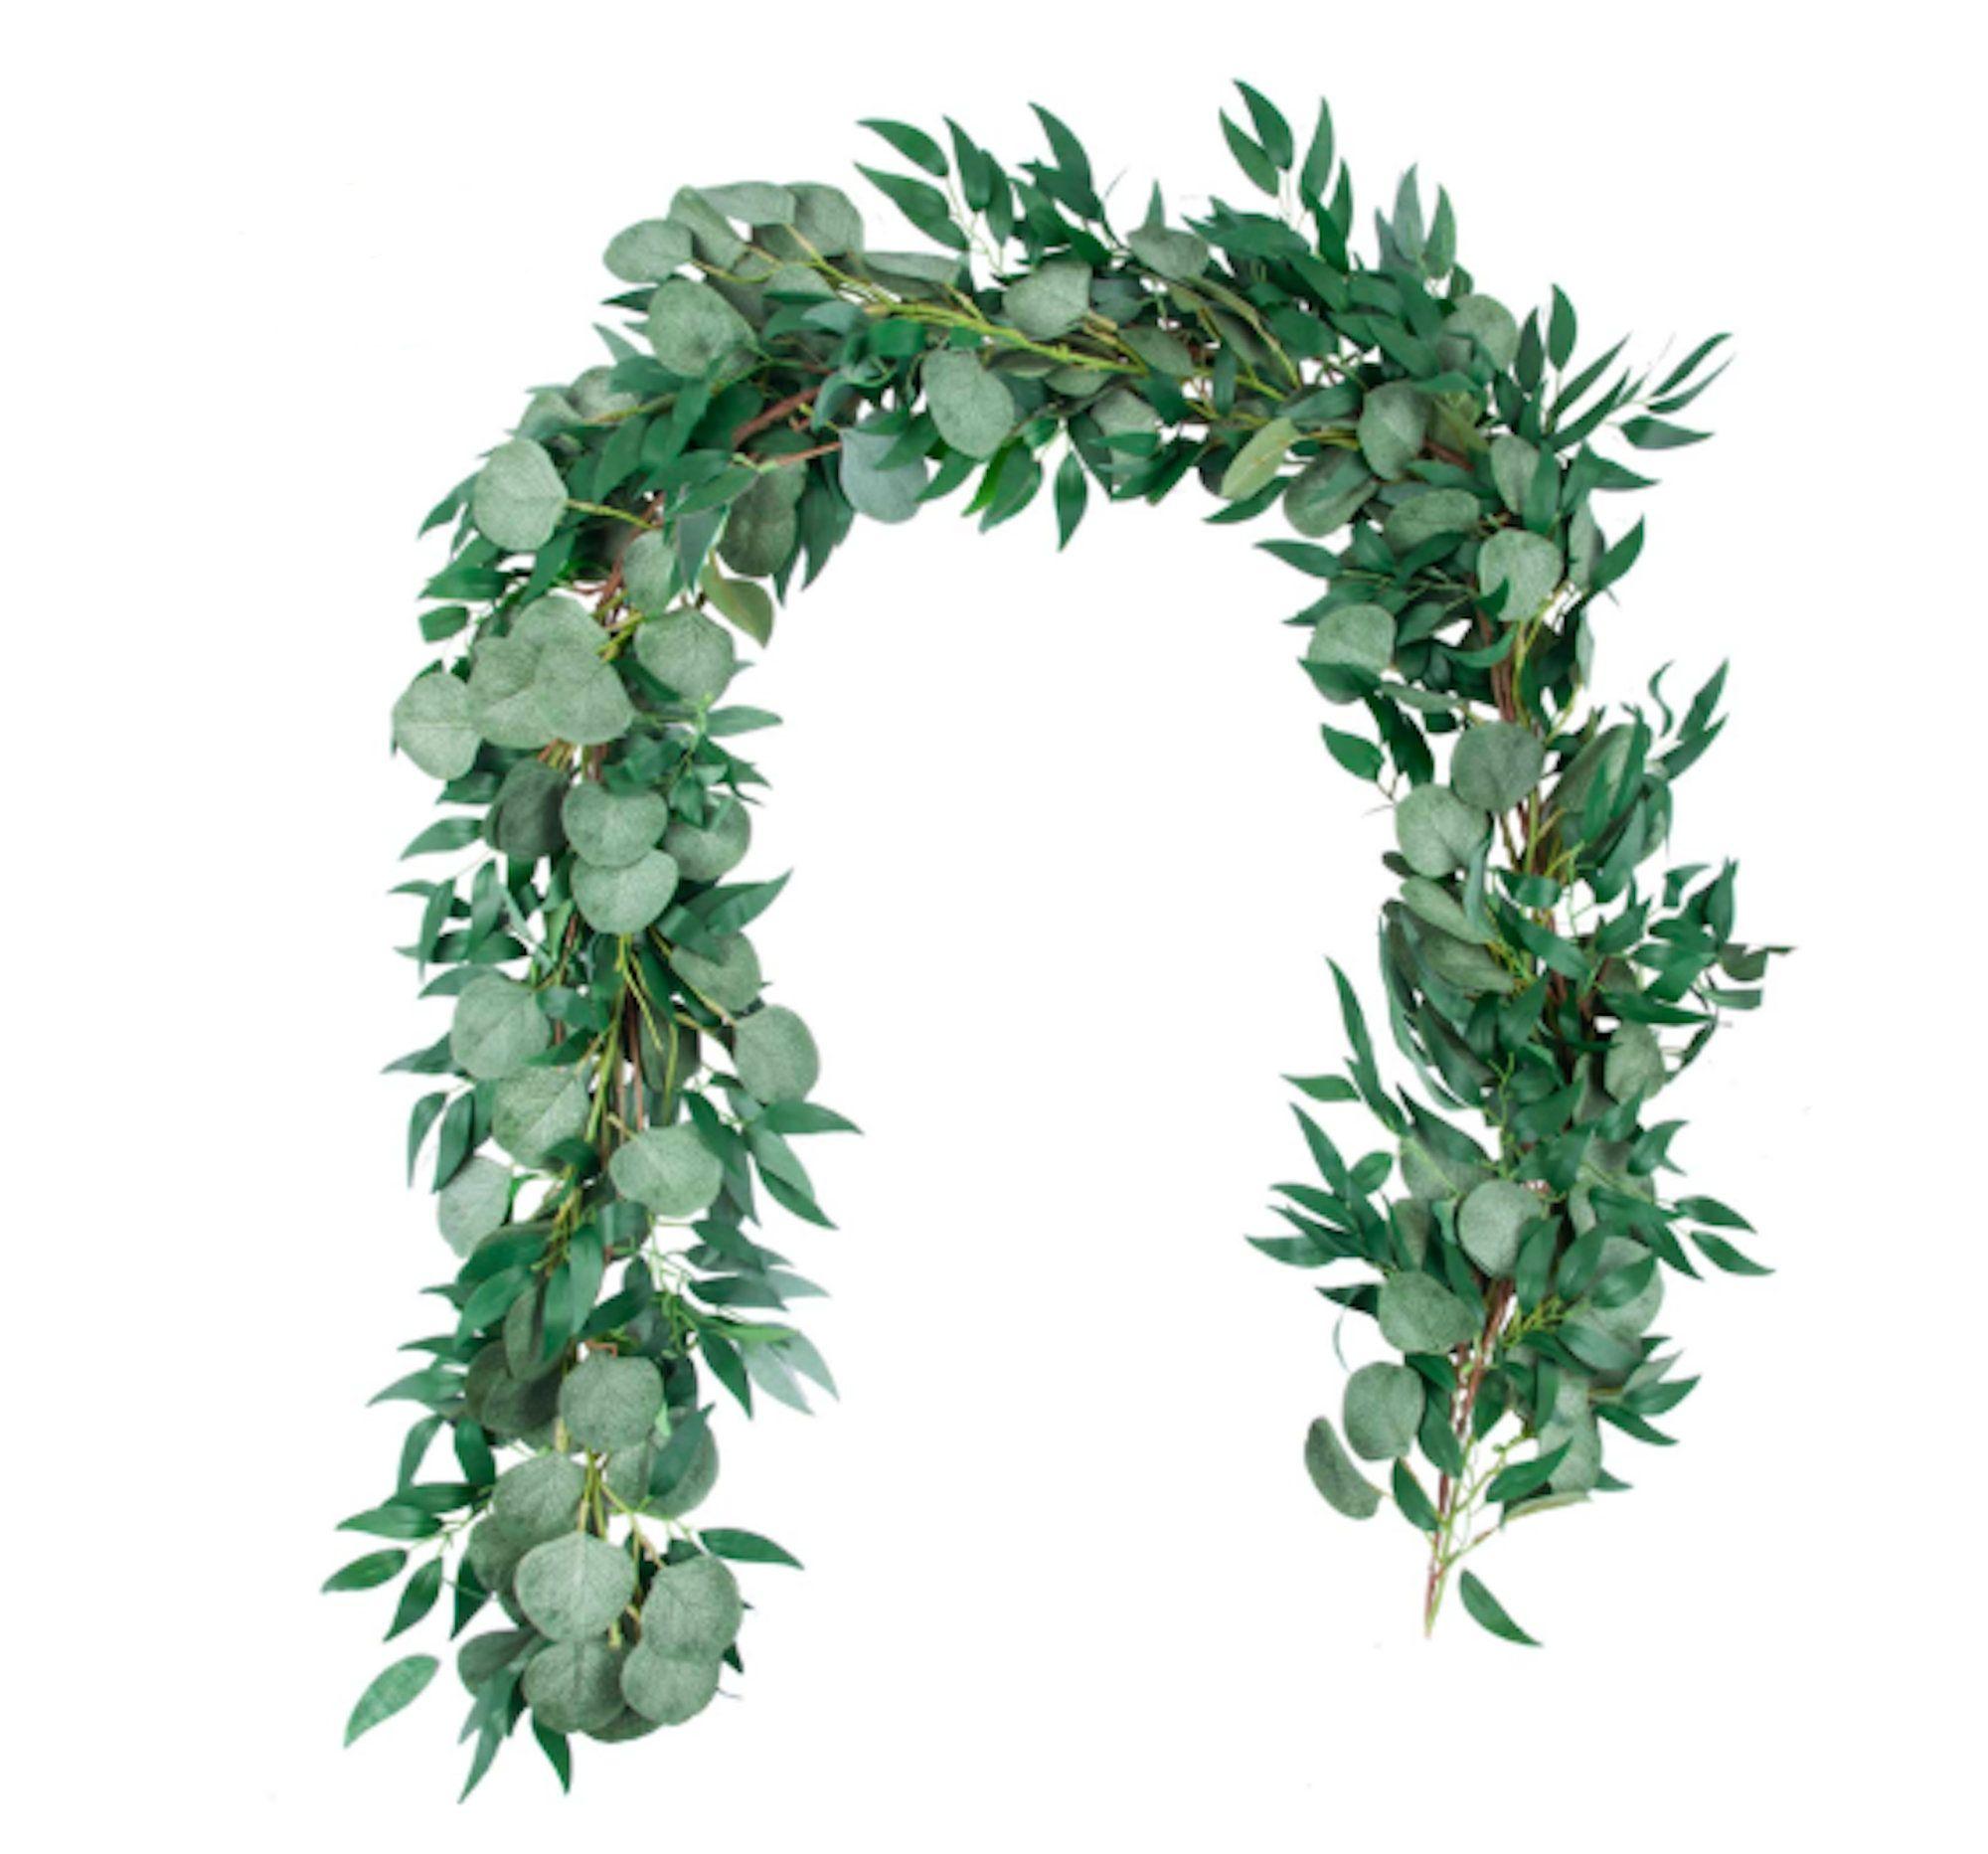 Artificial Silver Dollar Eucalyptus Leaves Plant Garland Greenery Wedding Decor